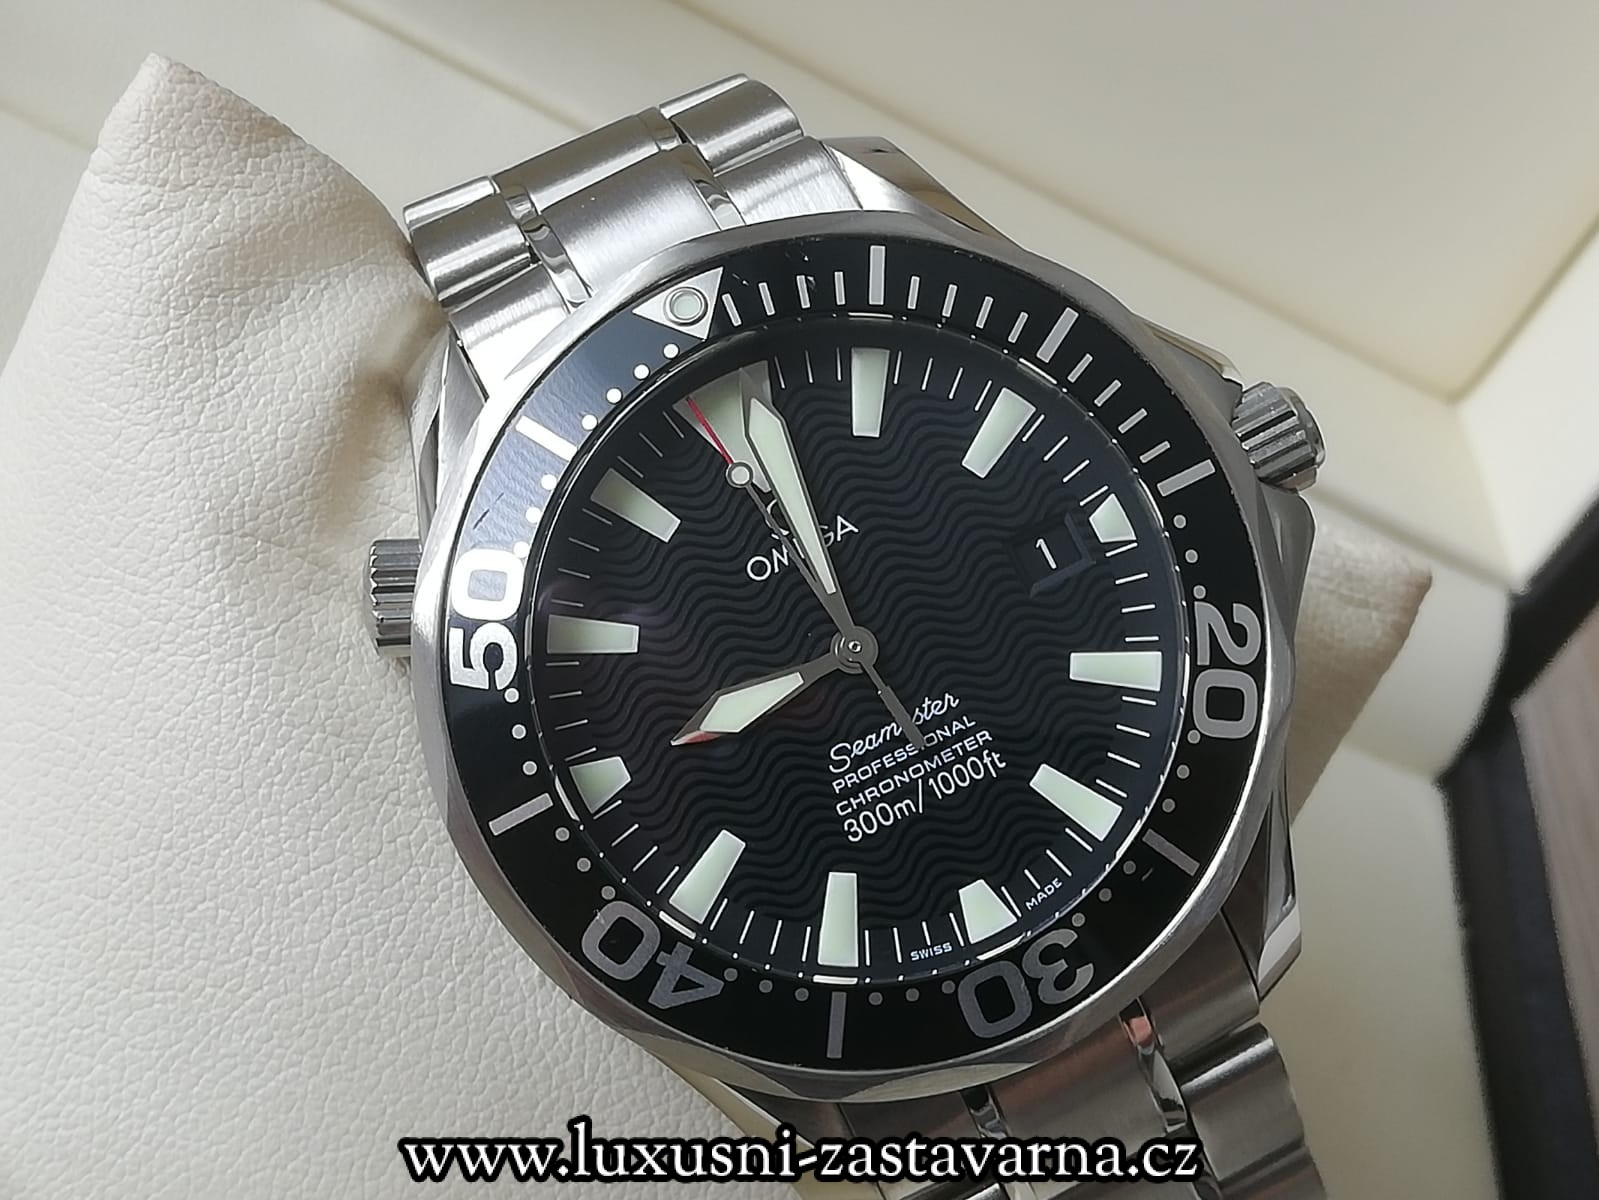 Omega_Seamaster_Professional_300M_41mm_012